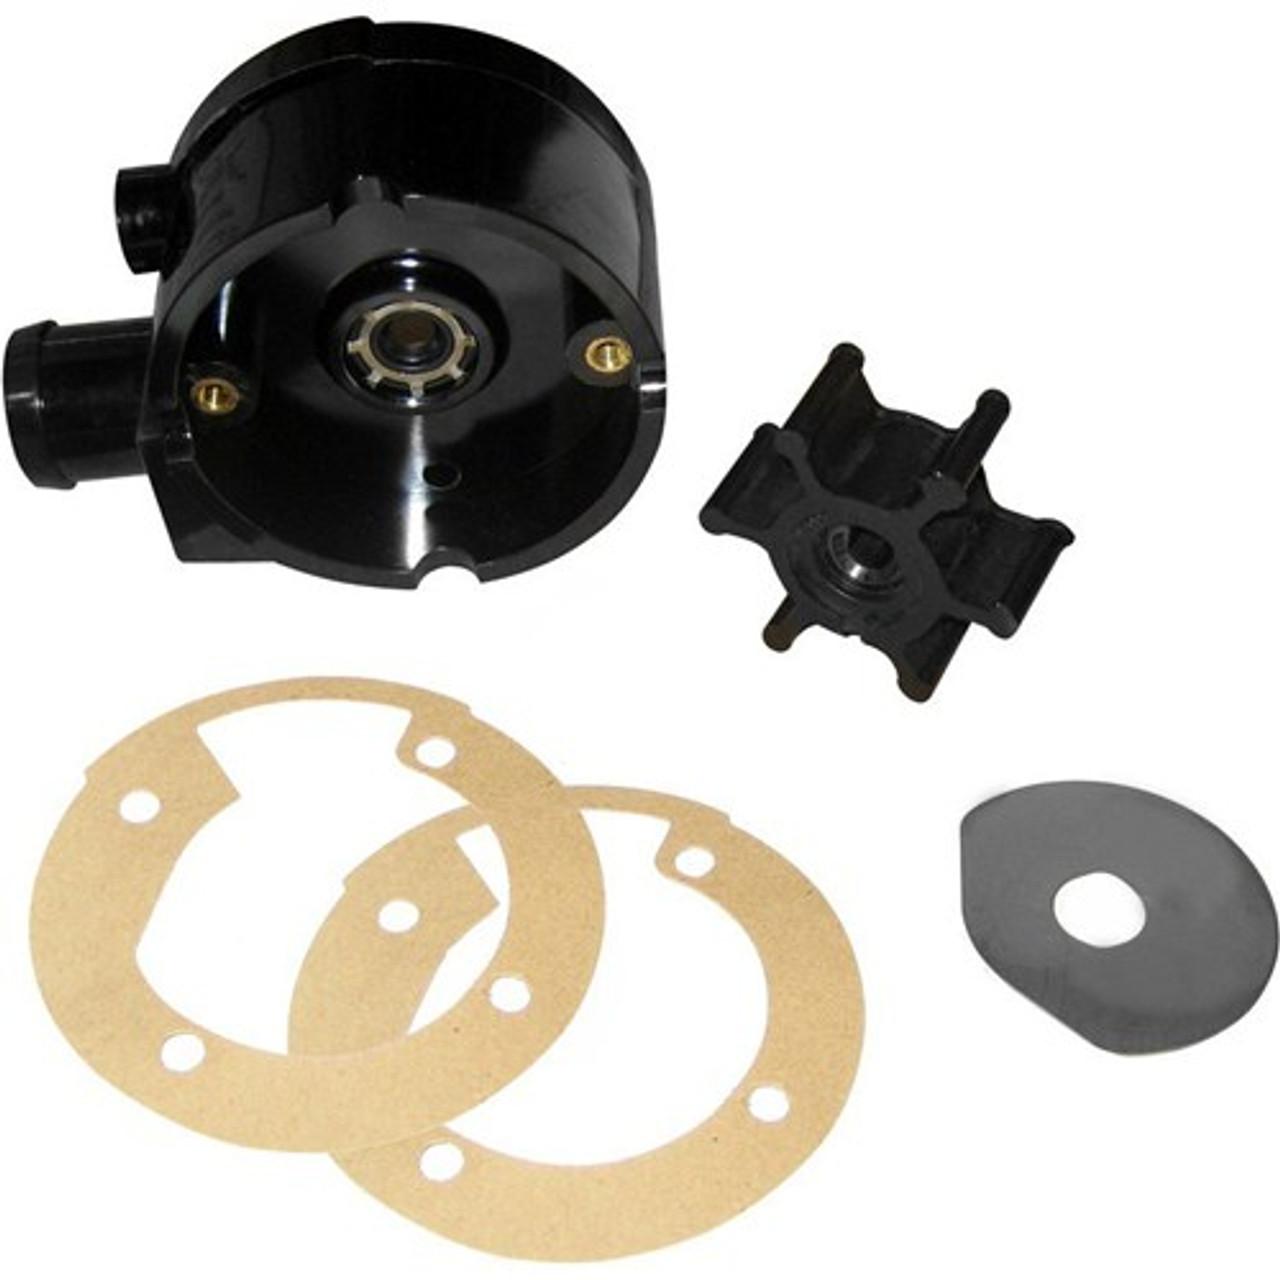 RWB Jabsco Service Kit for 18590 Waste Macerator Pump (J17-100 Jabsco 18598-1000)